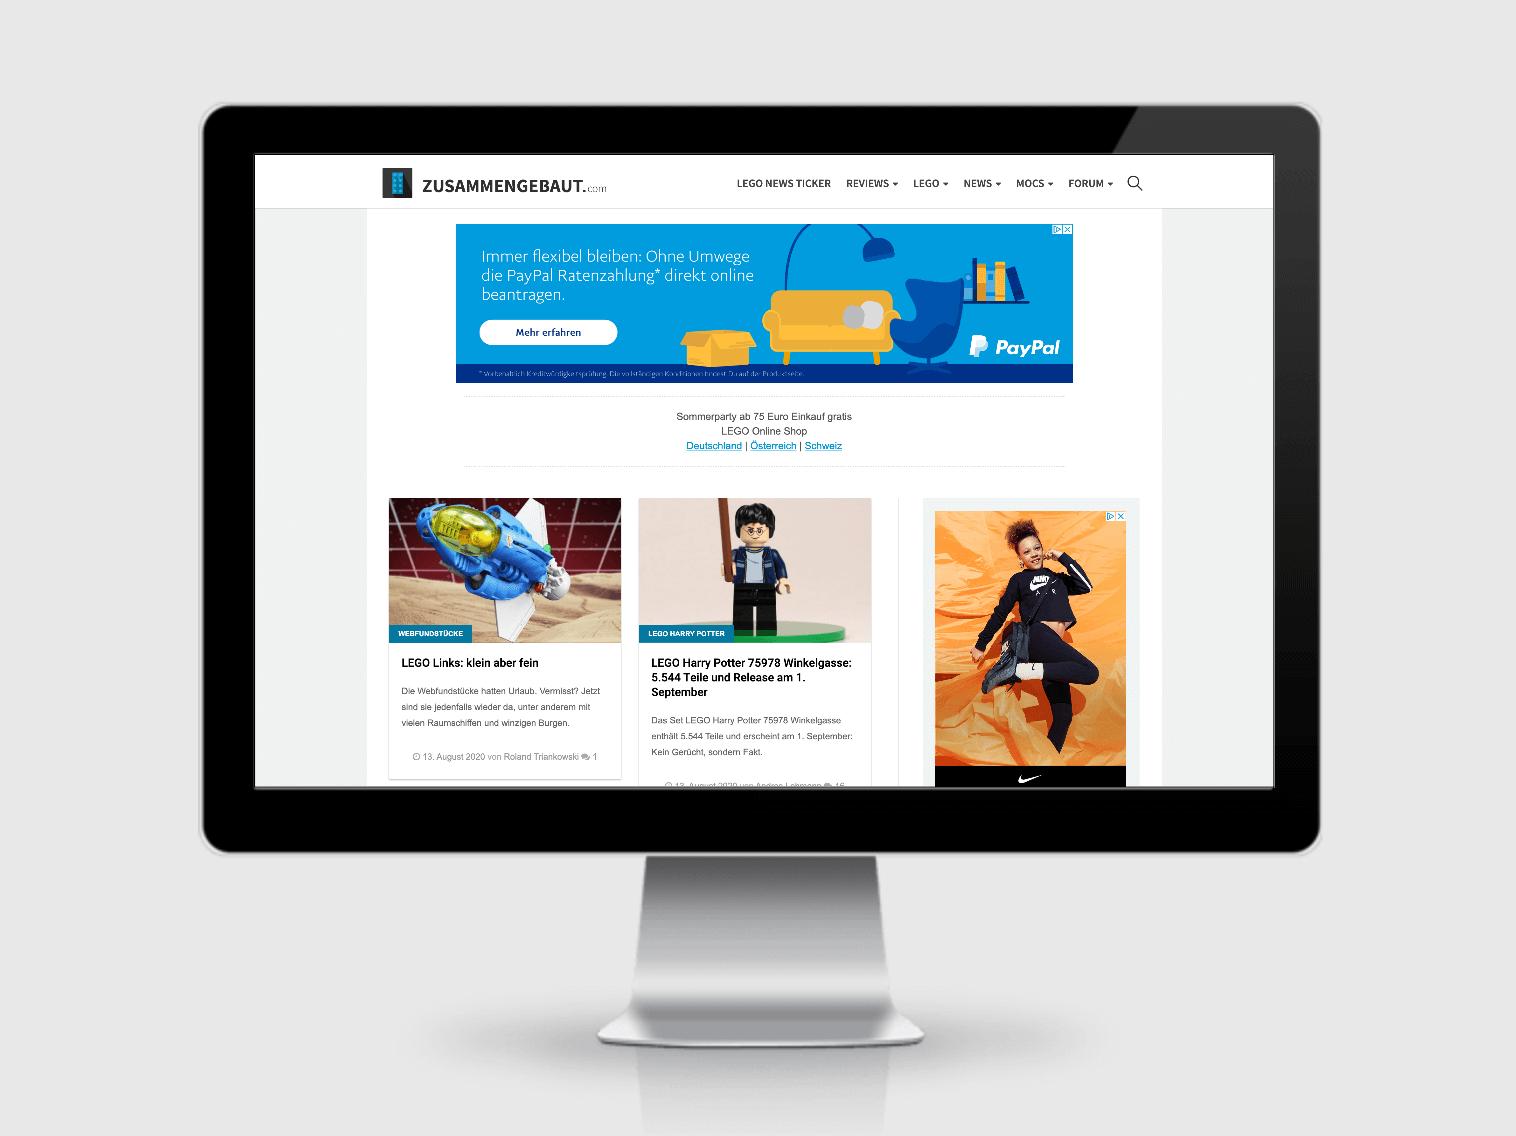 Website Zusammengebaut.com